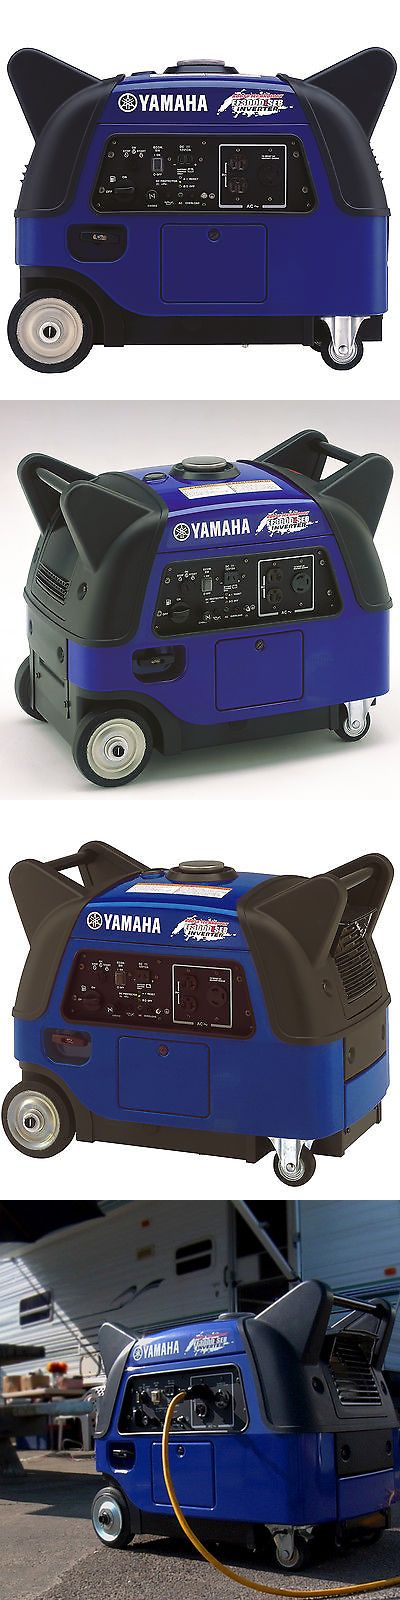 Generators 33082: Yamaha Ef3000iseb 3,000 Watt Gas Powered Portable Inverter Generator W Boost -> BUY IT NOW ONLY: $2222.1 on eBay!